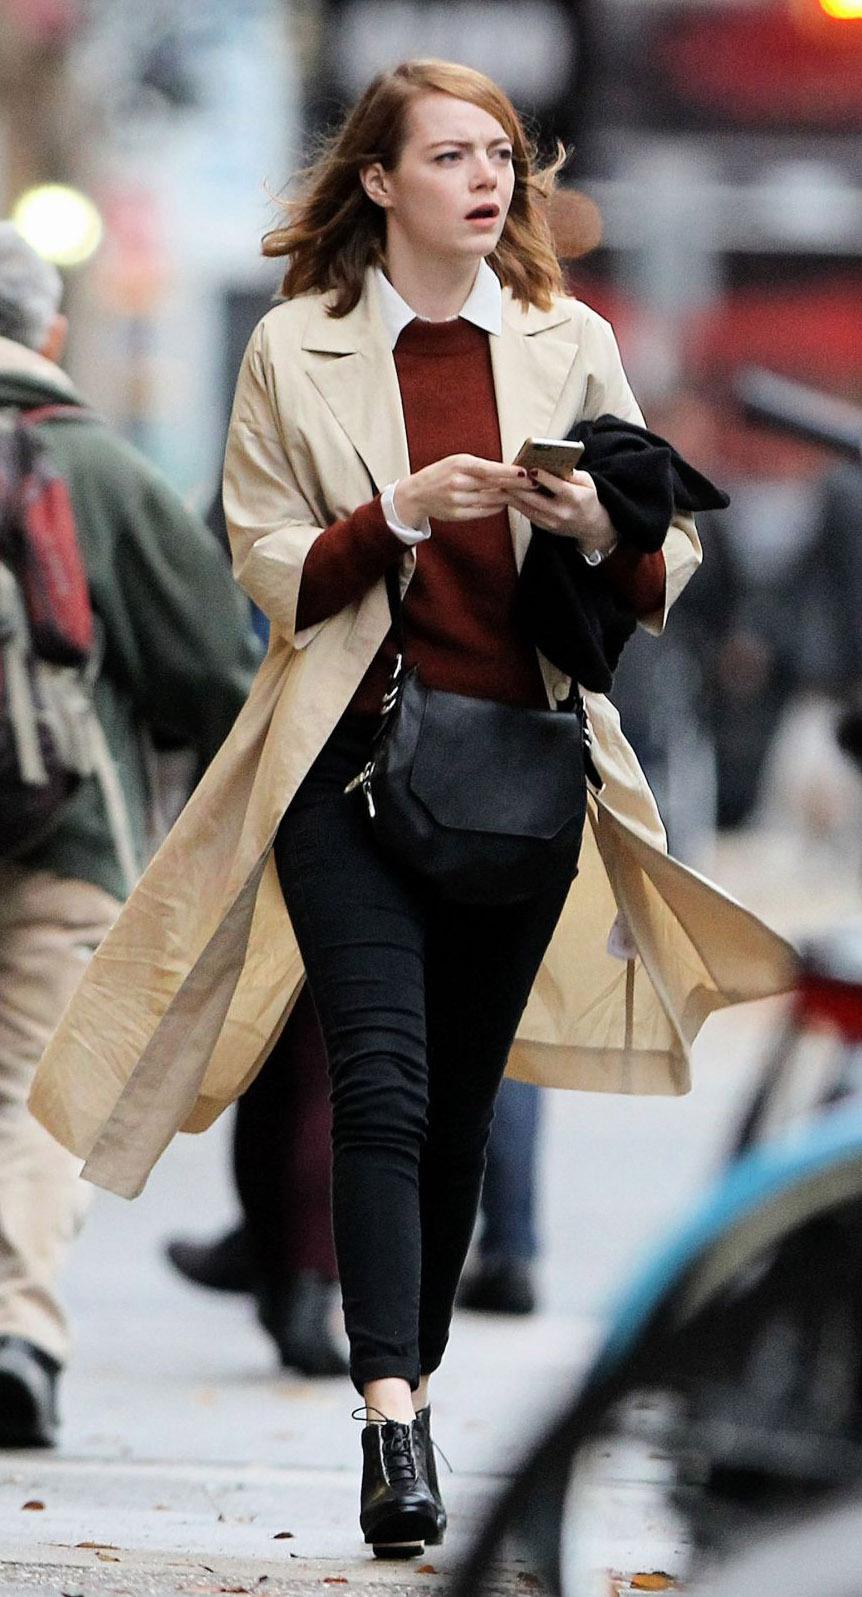 black-skinny-jeans-white-top-collared-shirt-r-burgundy-sweater-tan-jacket-coat-trench-fall-winter-black-shoe-booties-black-bag-emmastone-celebrity-newyork-hairr-lunch.jpg